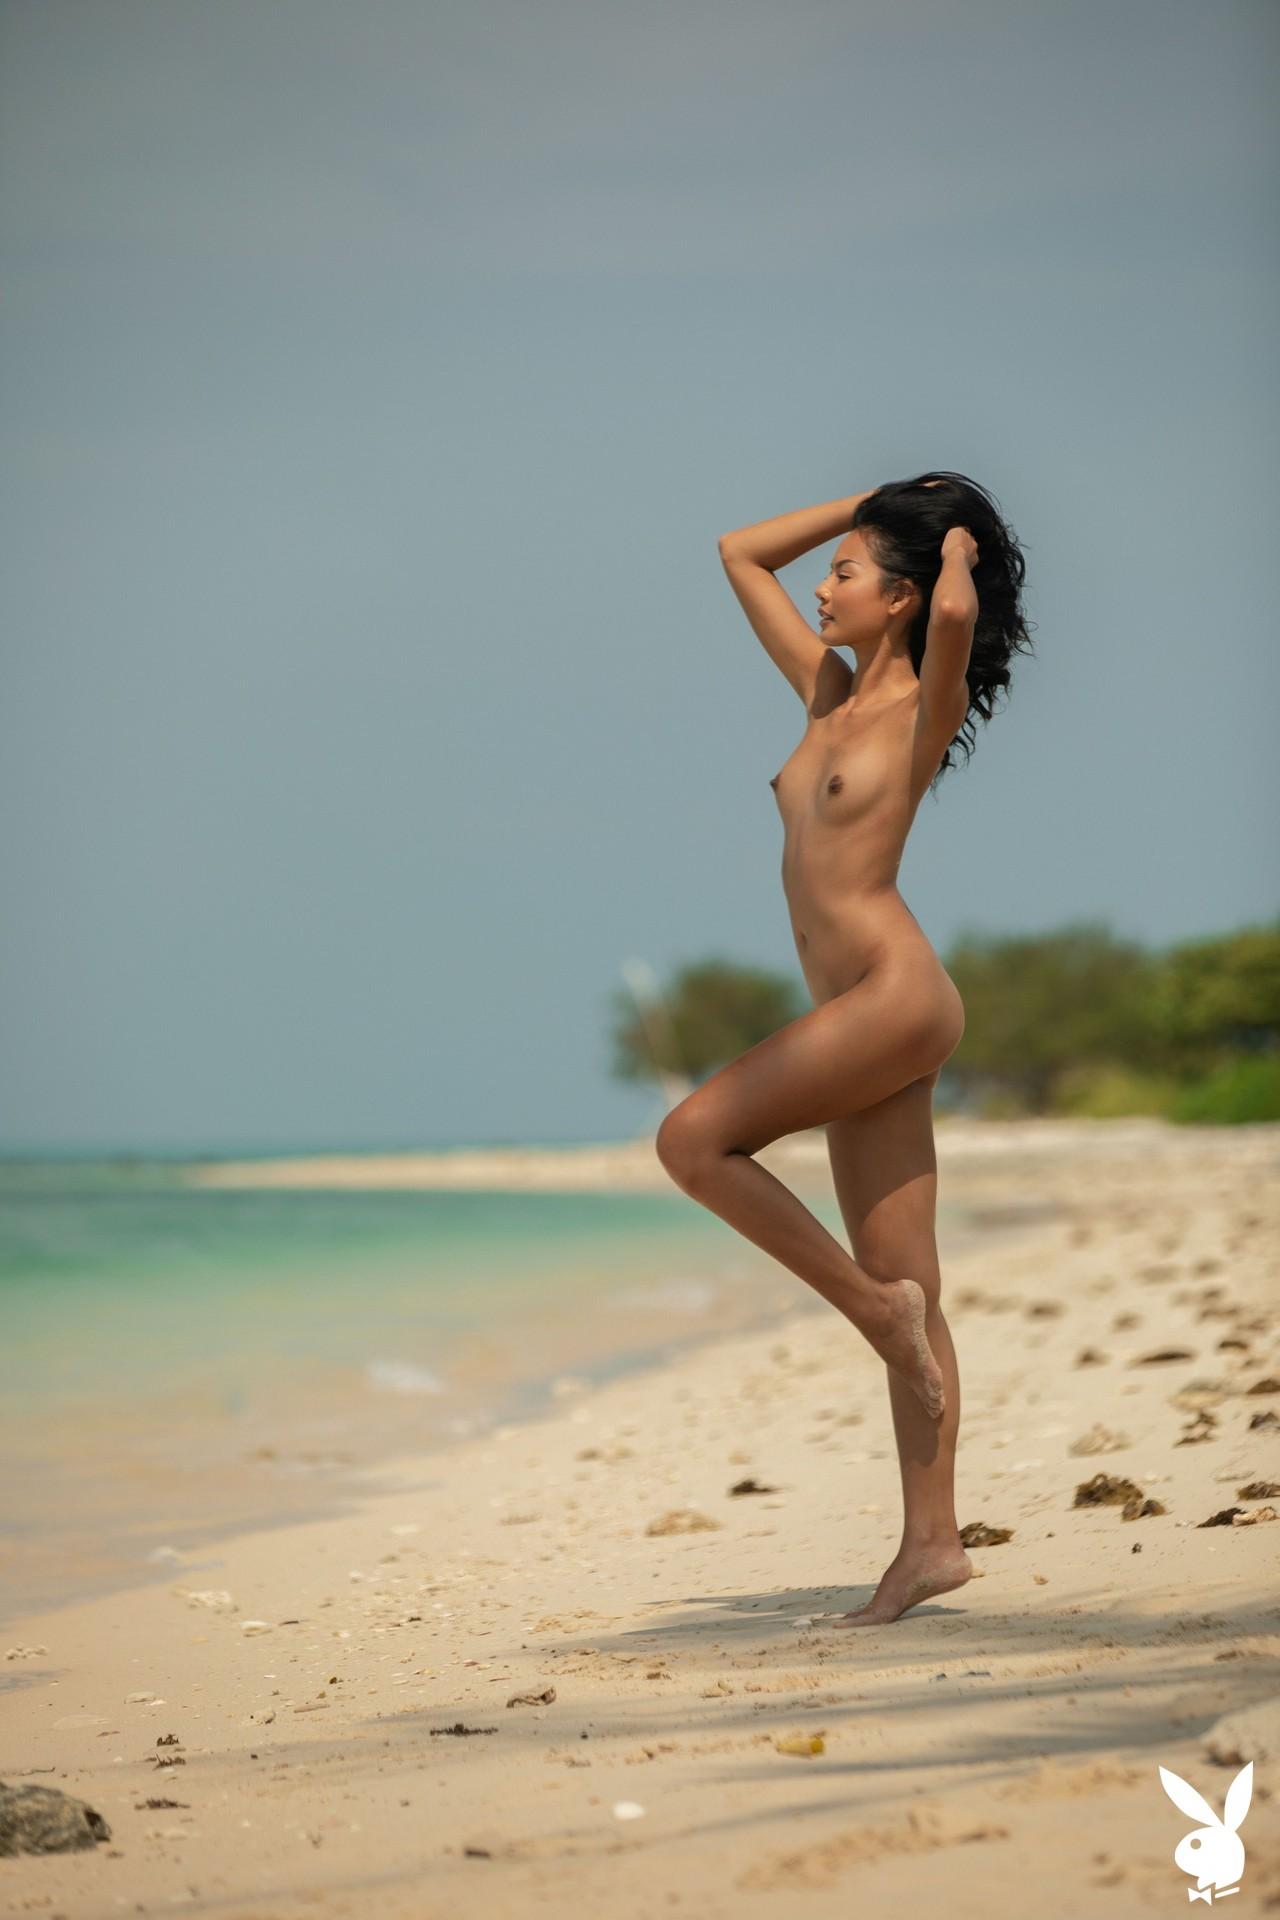 Magen Hana In Island Mentality Playboy Plus (14)